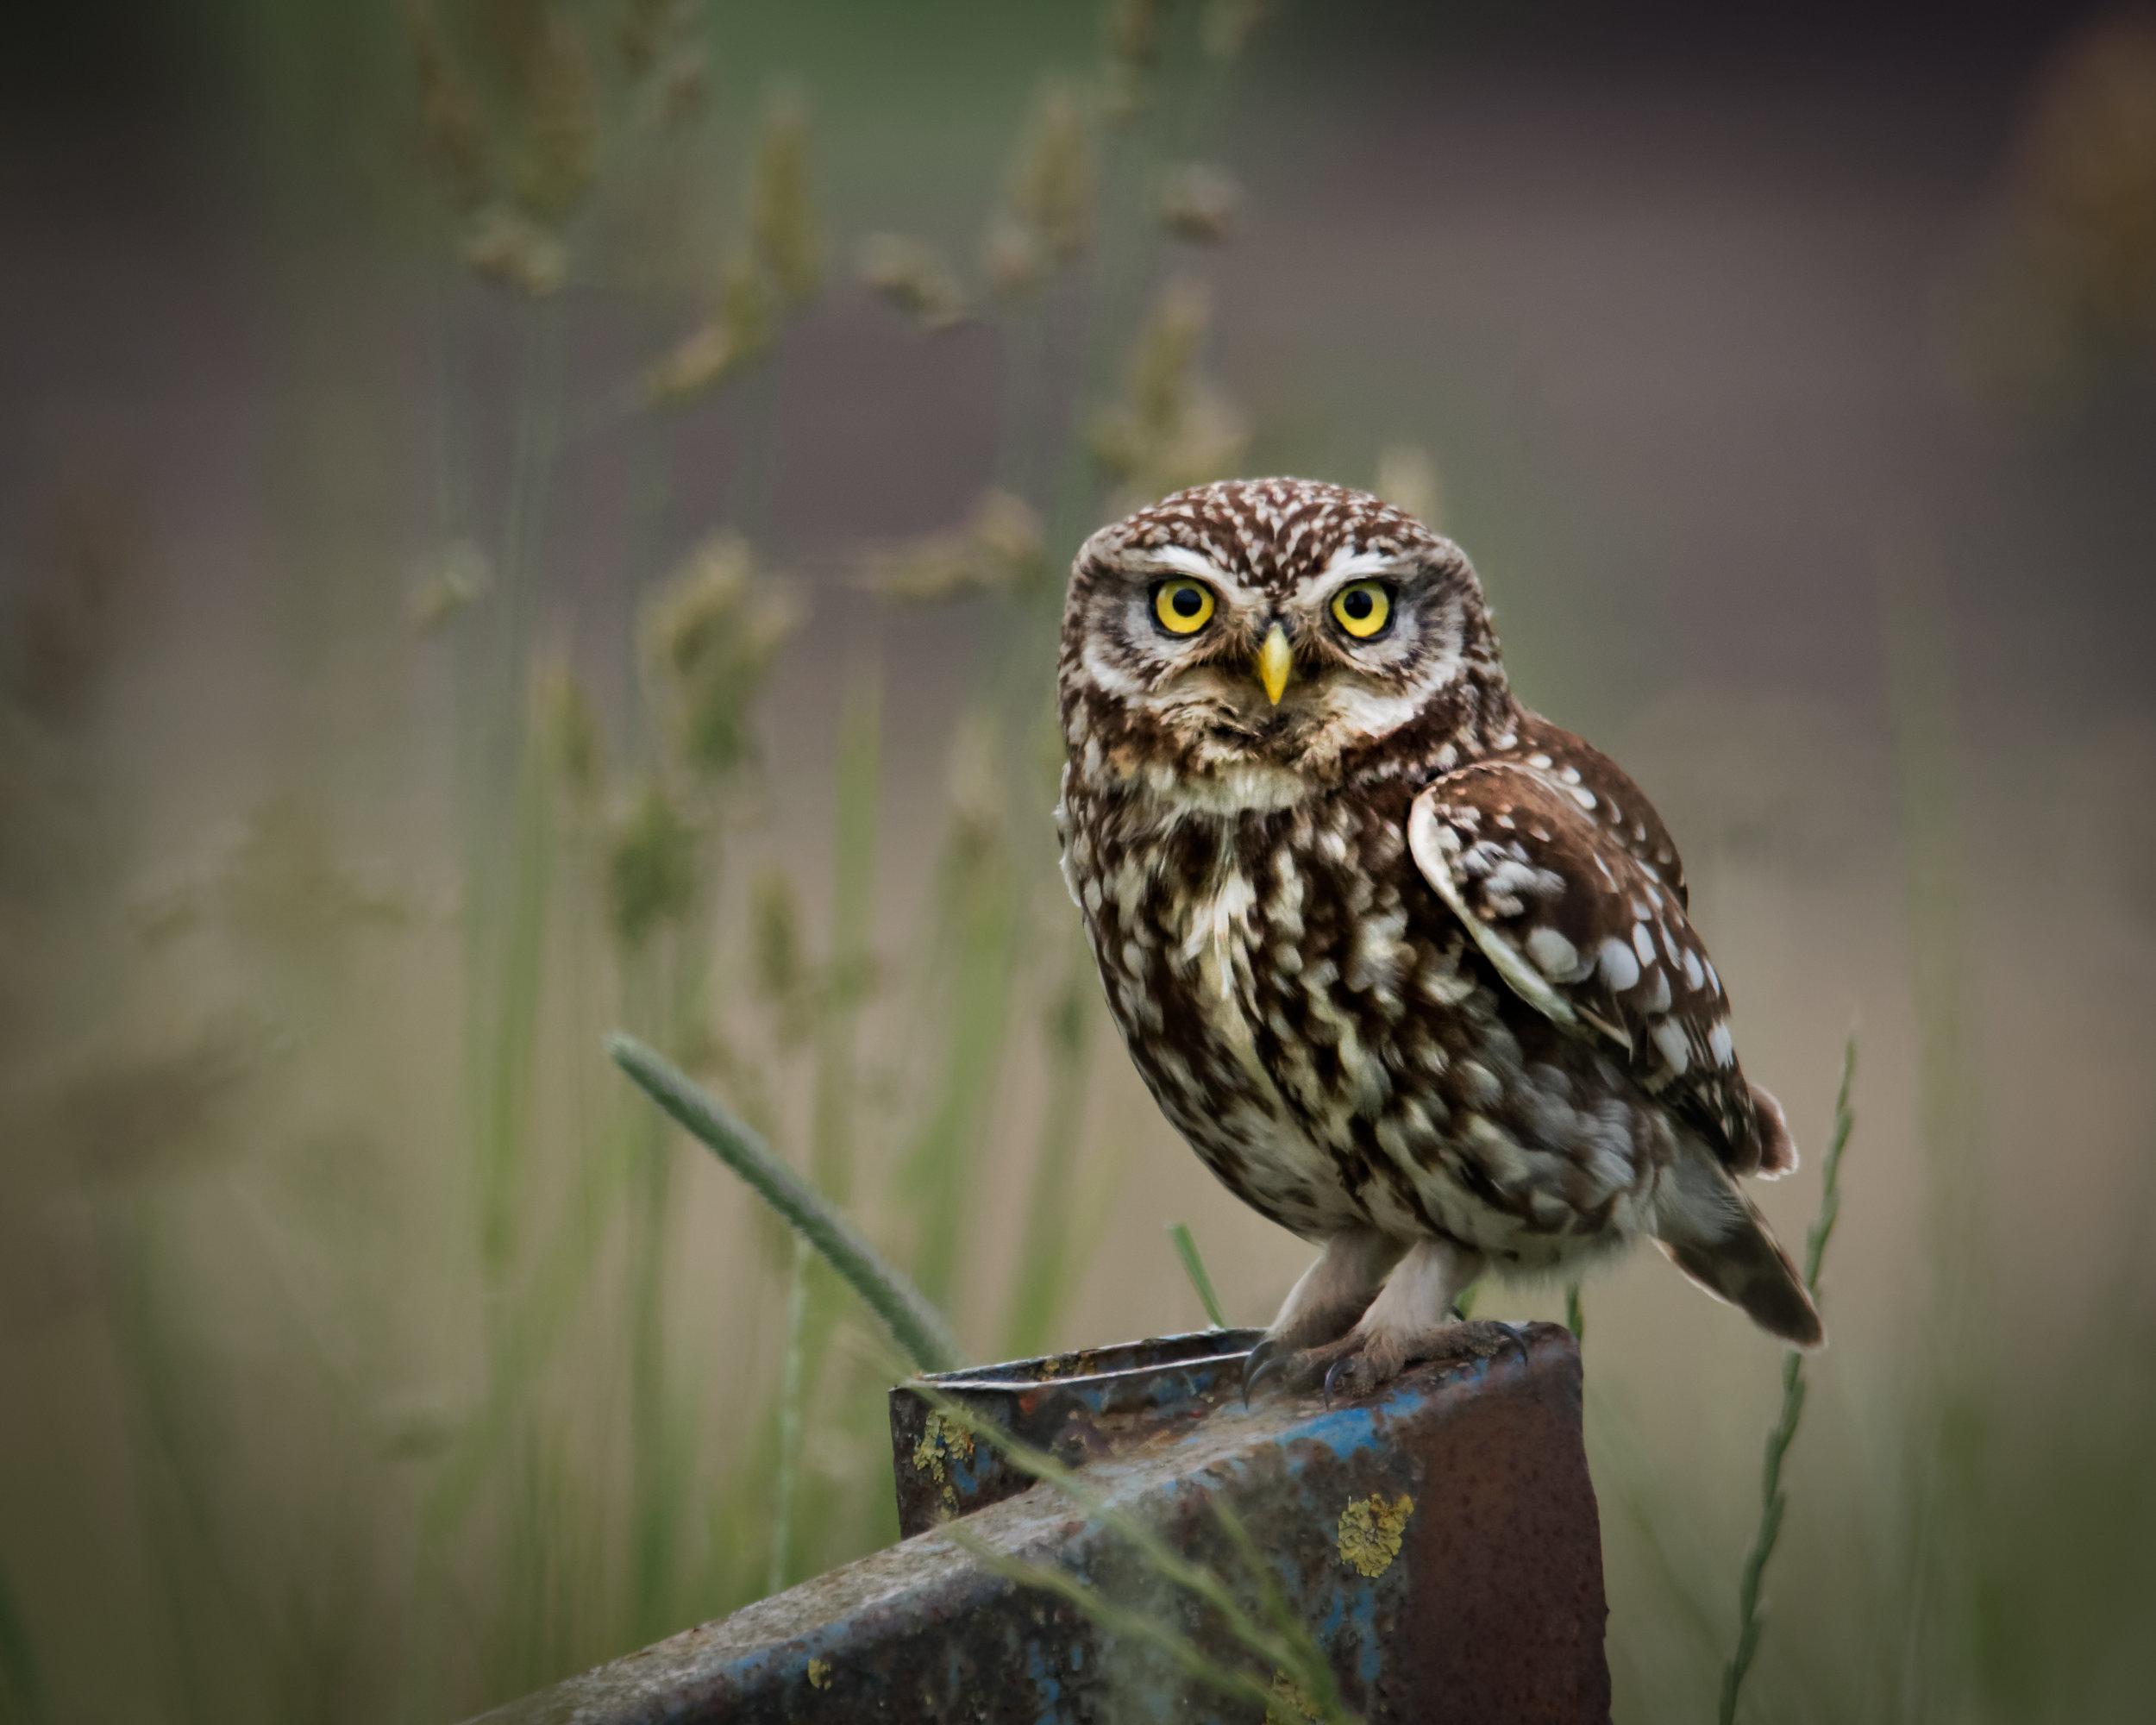 wild little owl sat on edge of farm equipment, looking forward.(Athene noctua)